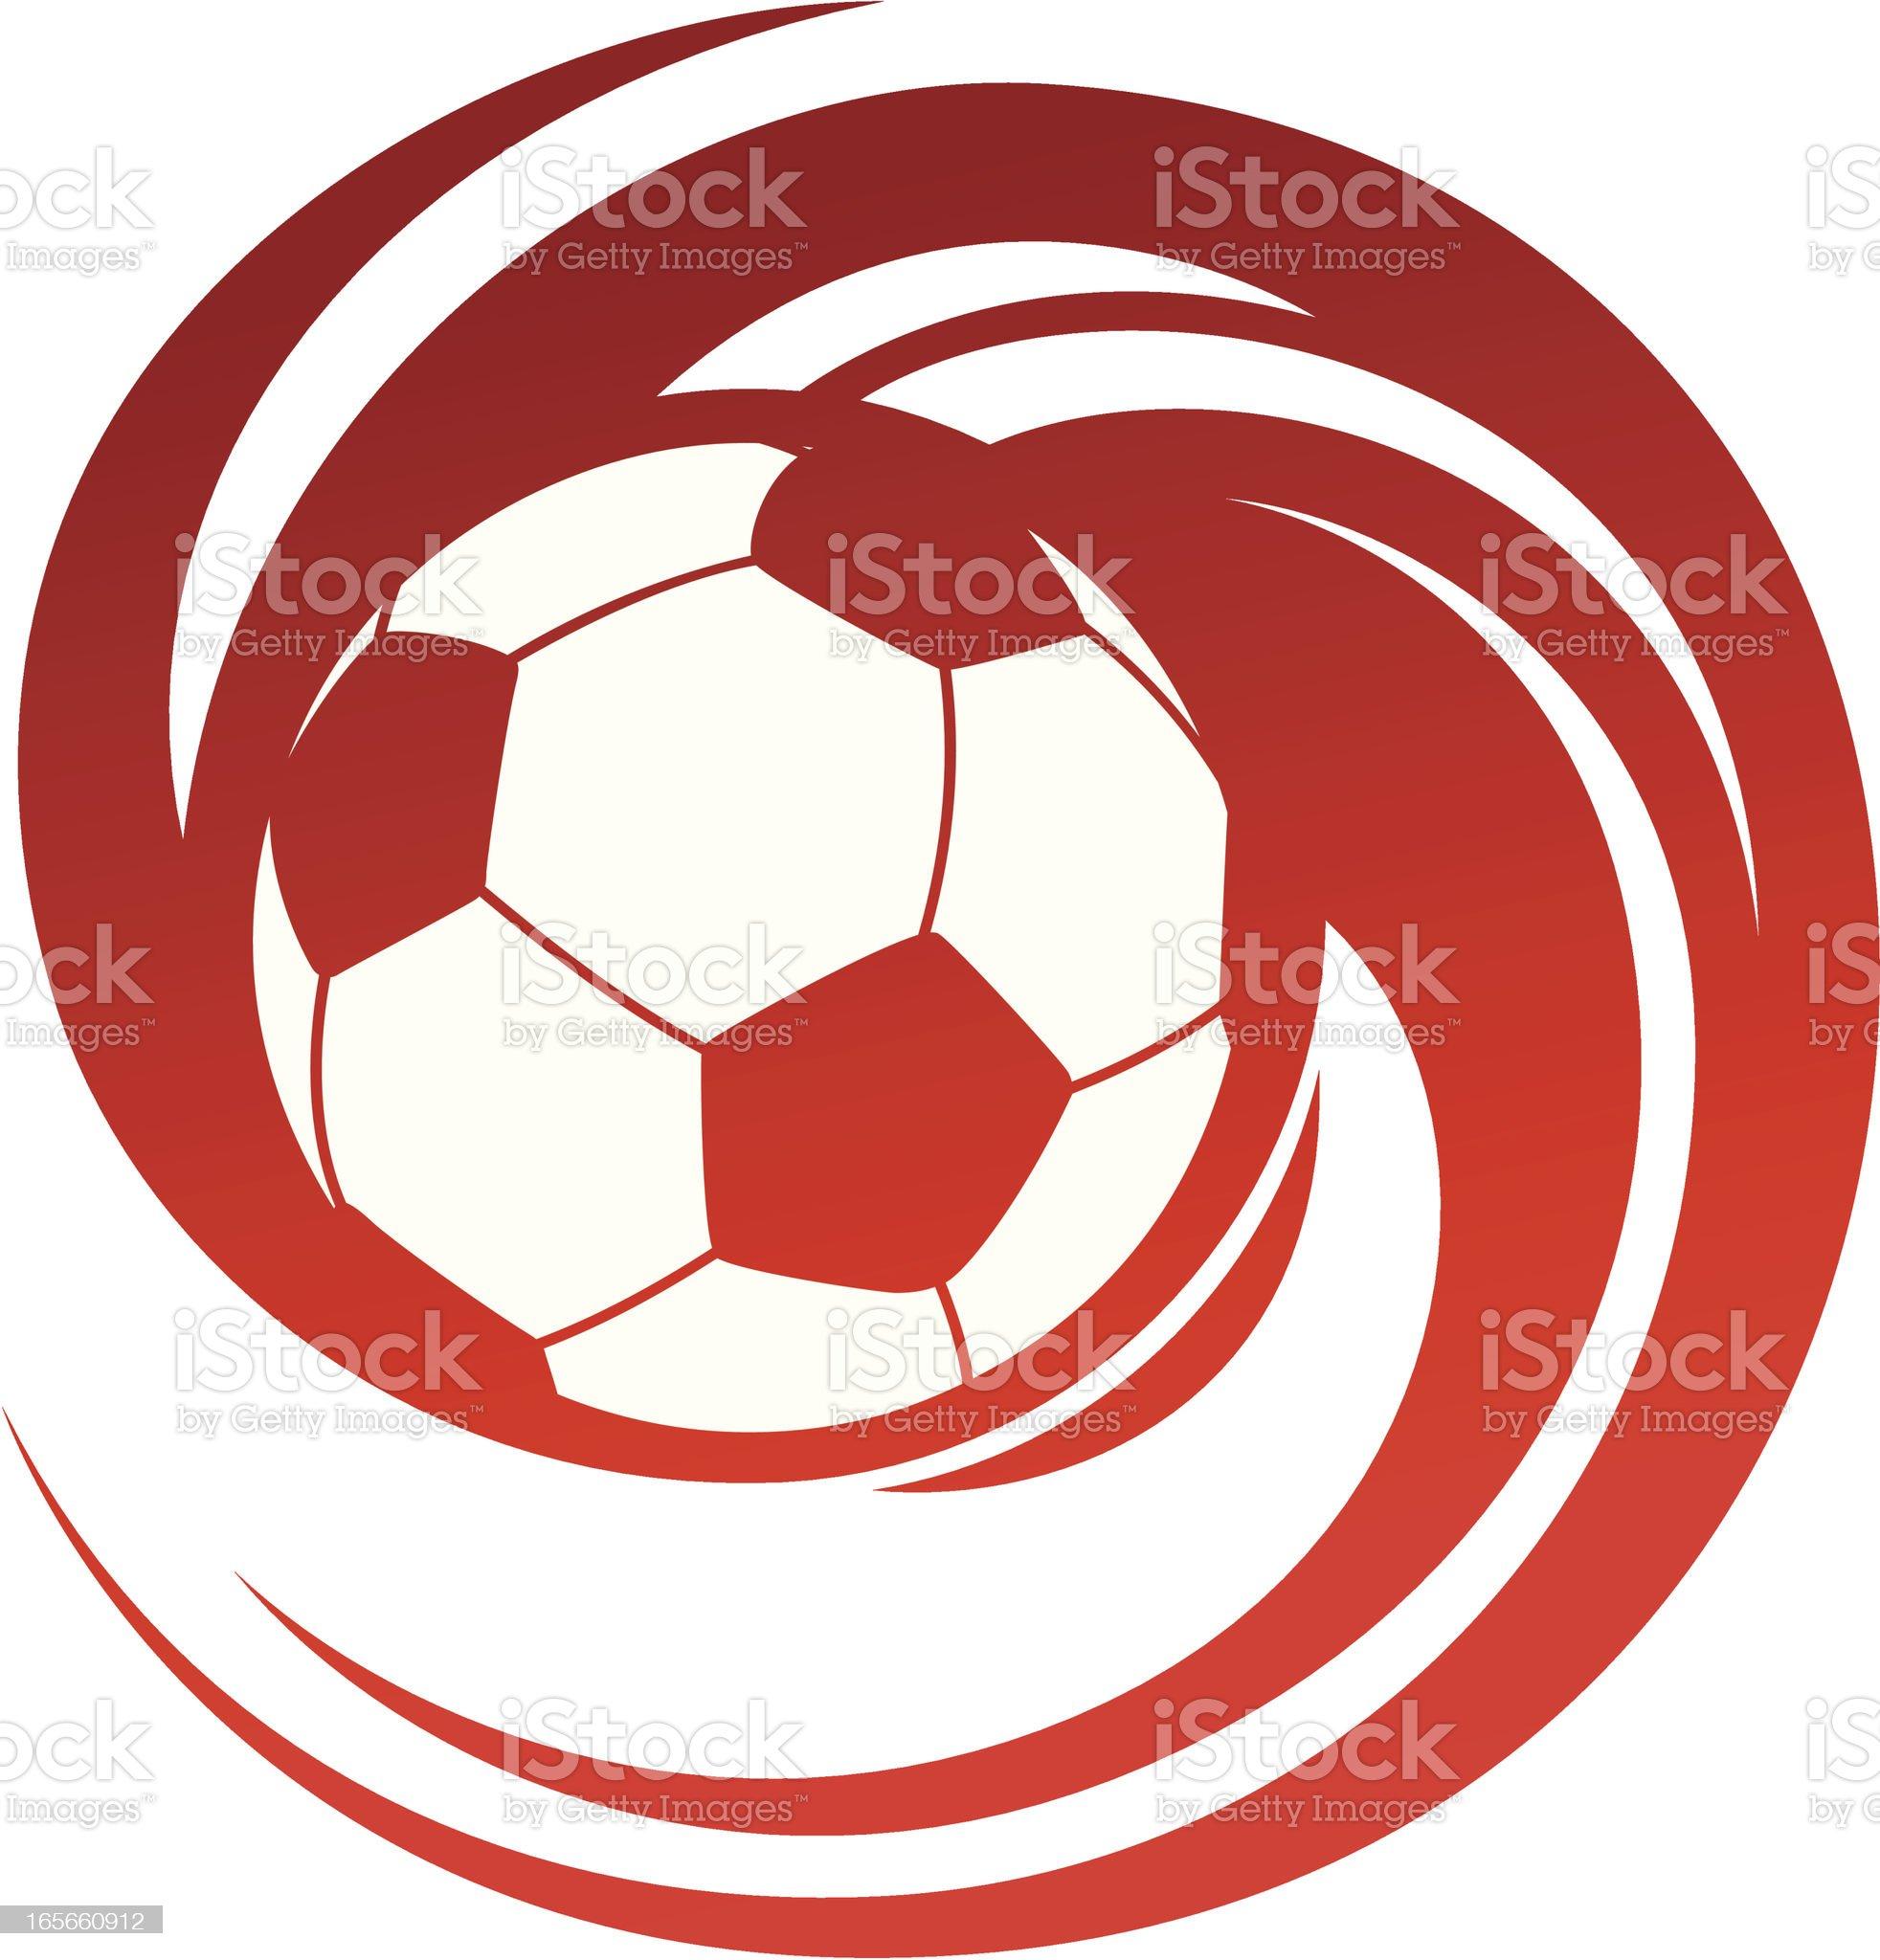 Spinning soccer royalty-free stock vector art